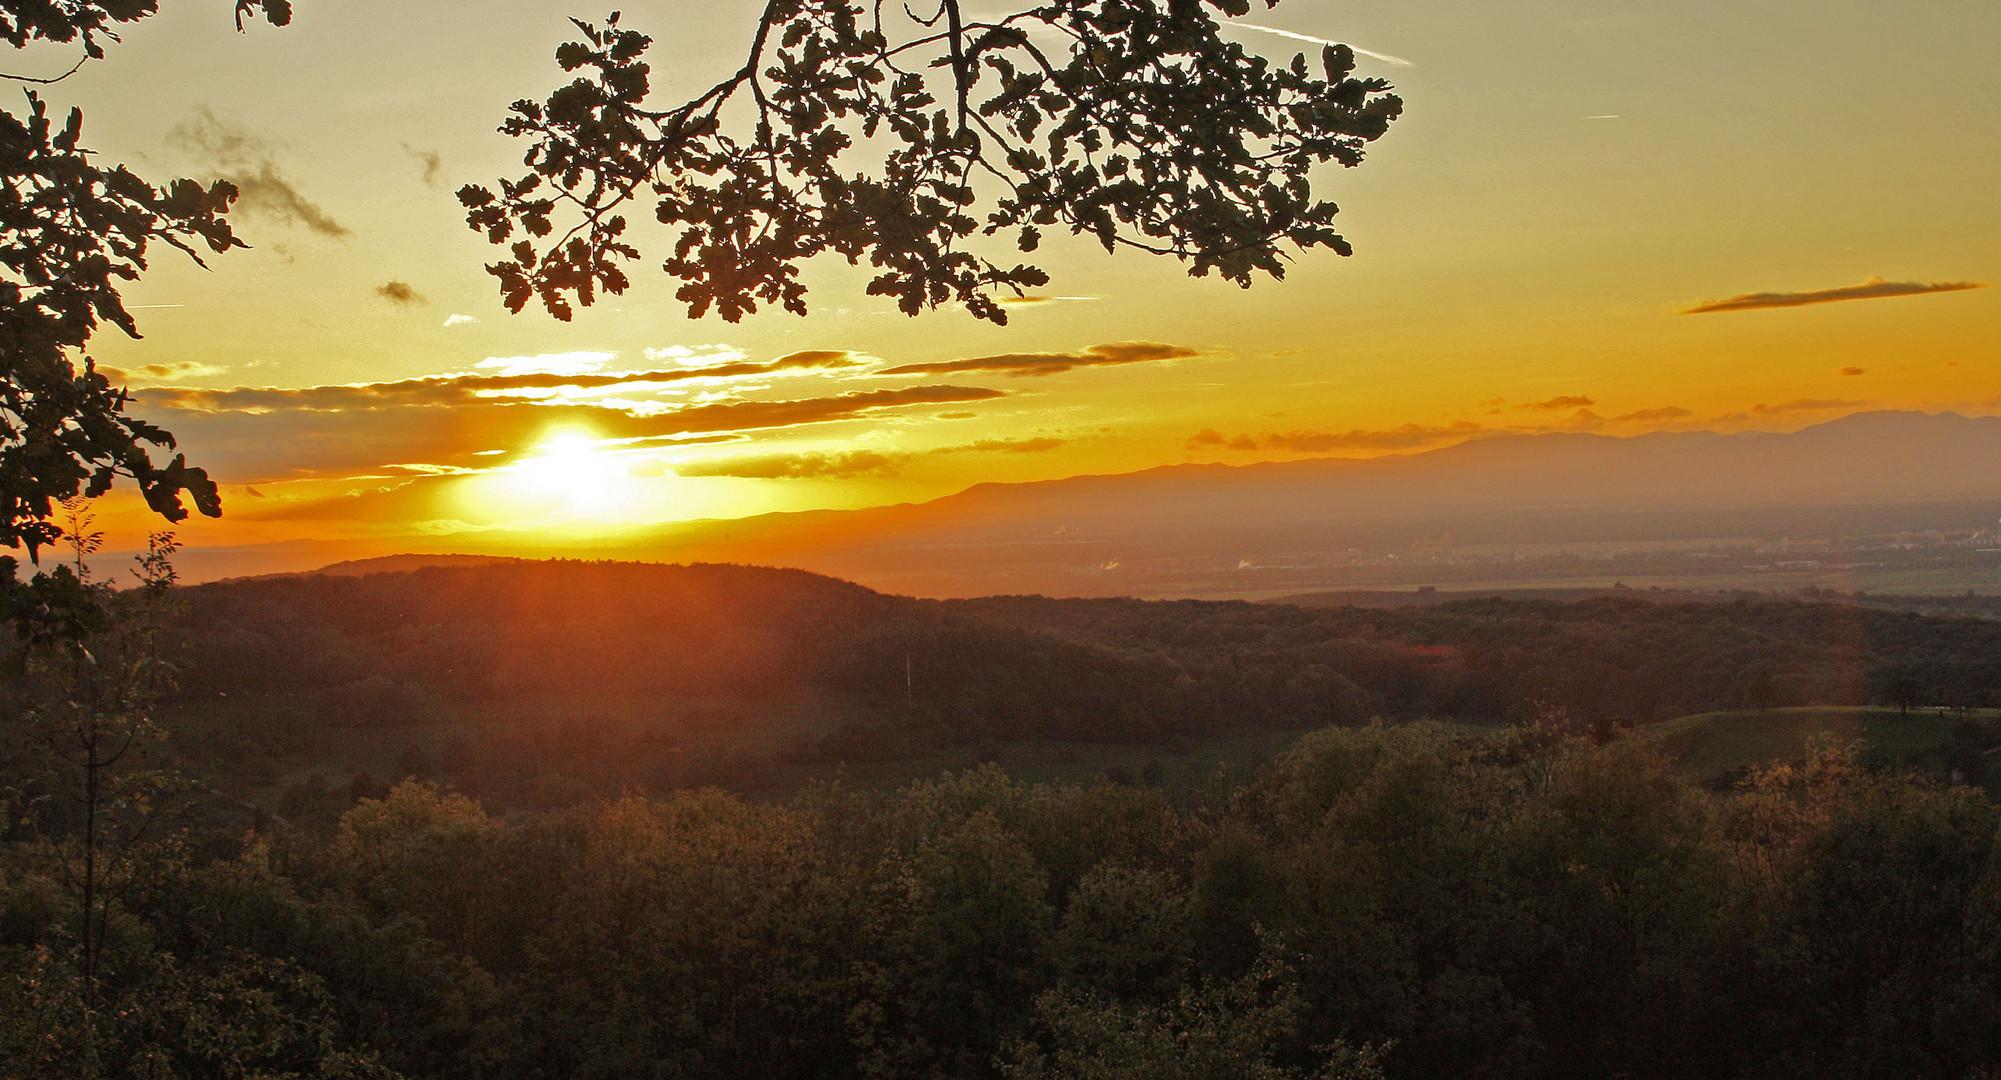 Sonnenuntergang im Markgräfler Land